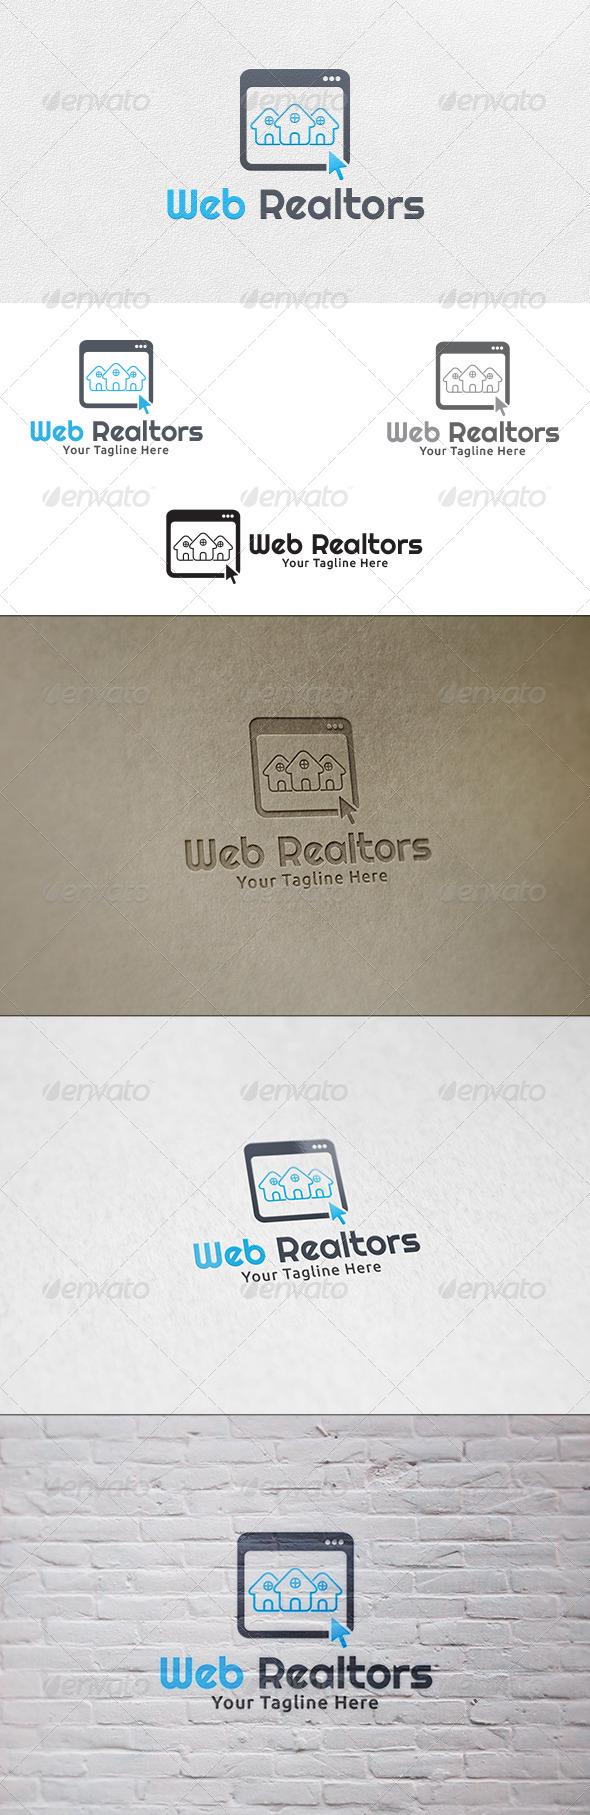 Web Realtors - Logo Template - Buildings Logo Templates